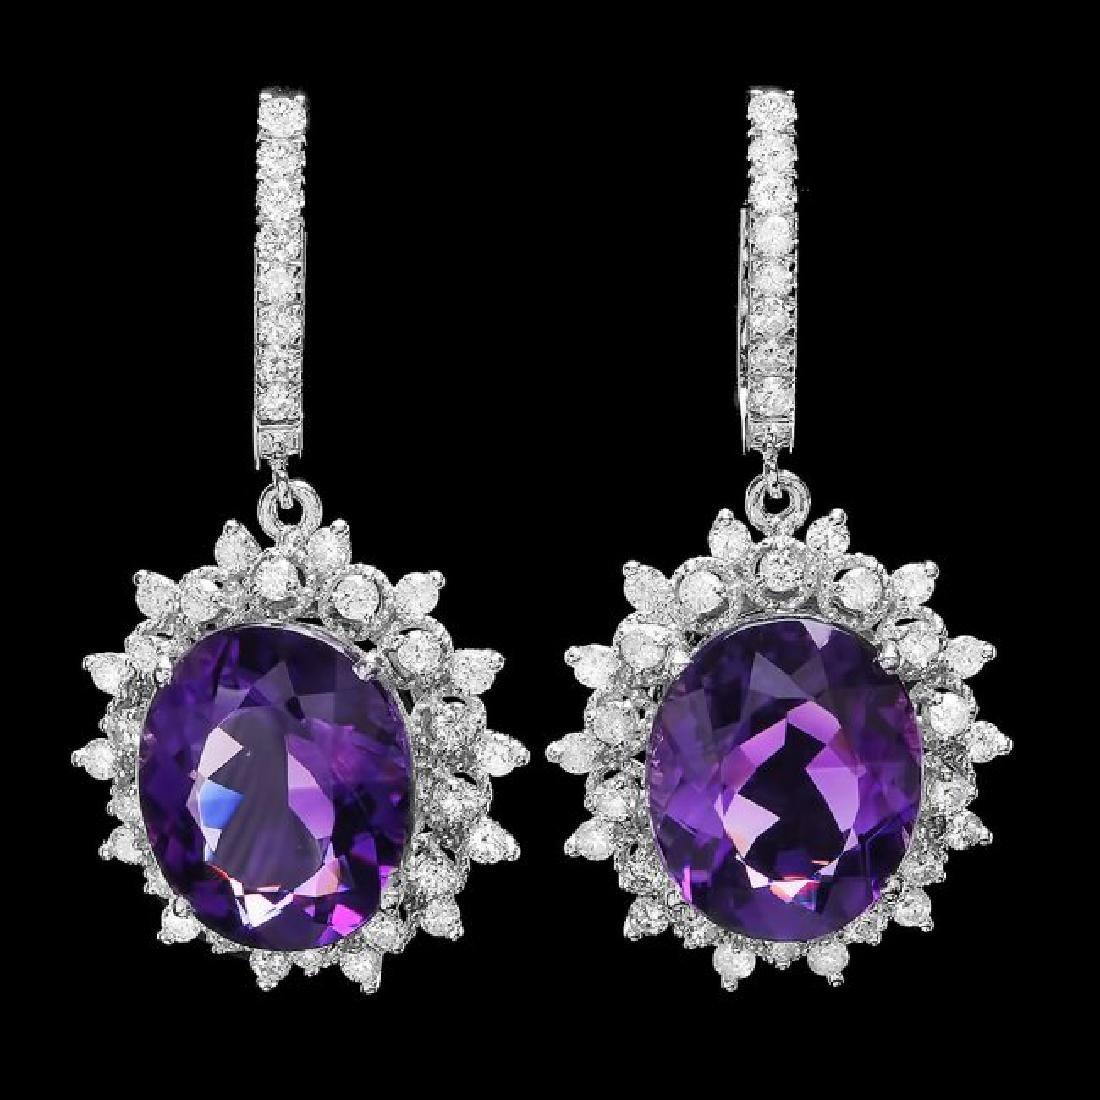 14k Gold 15.00ct Amethyst 2.00ct Diamond Earrings - 2